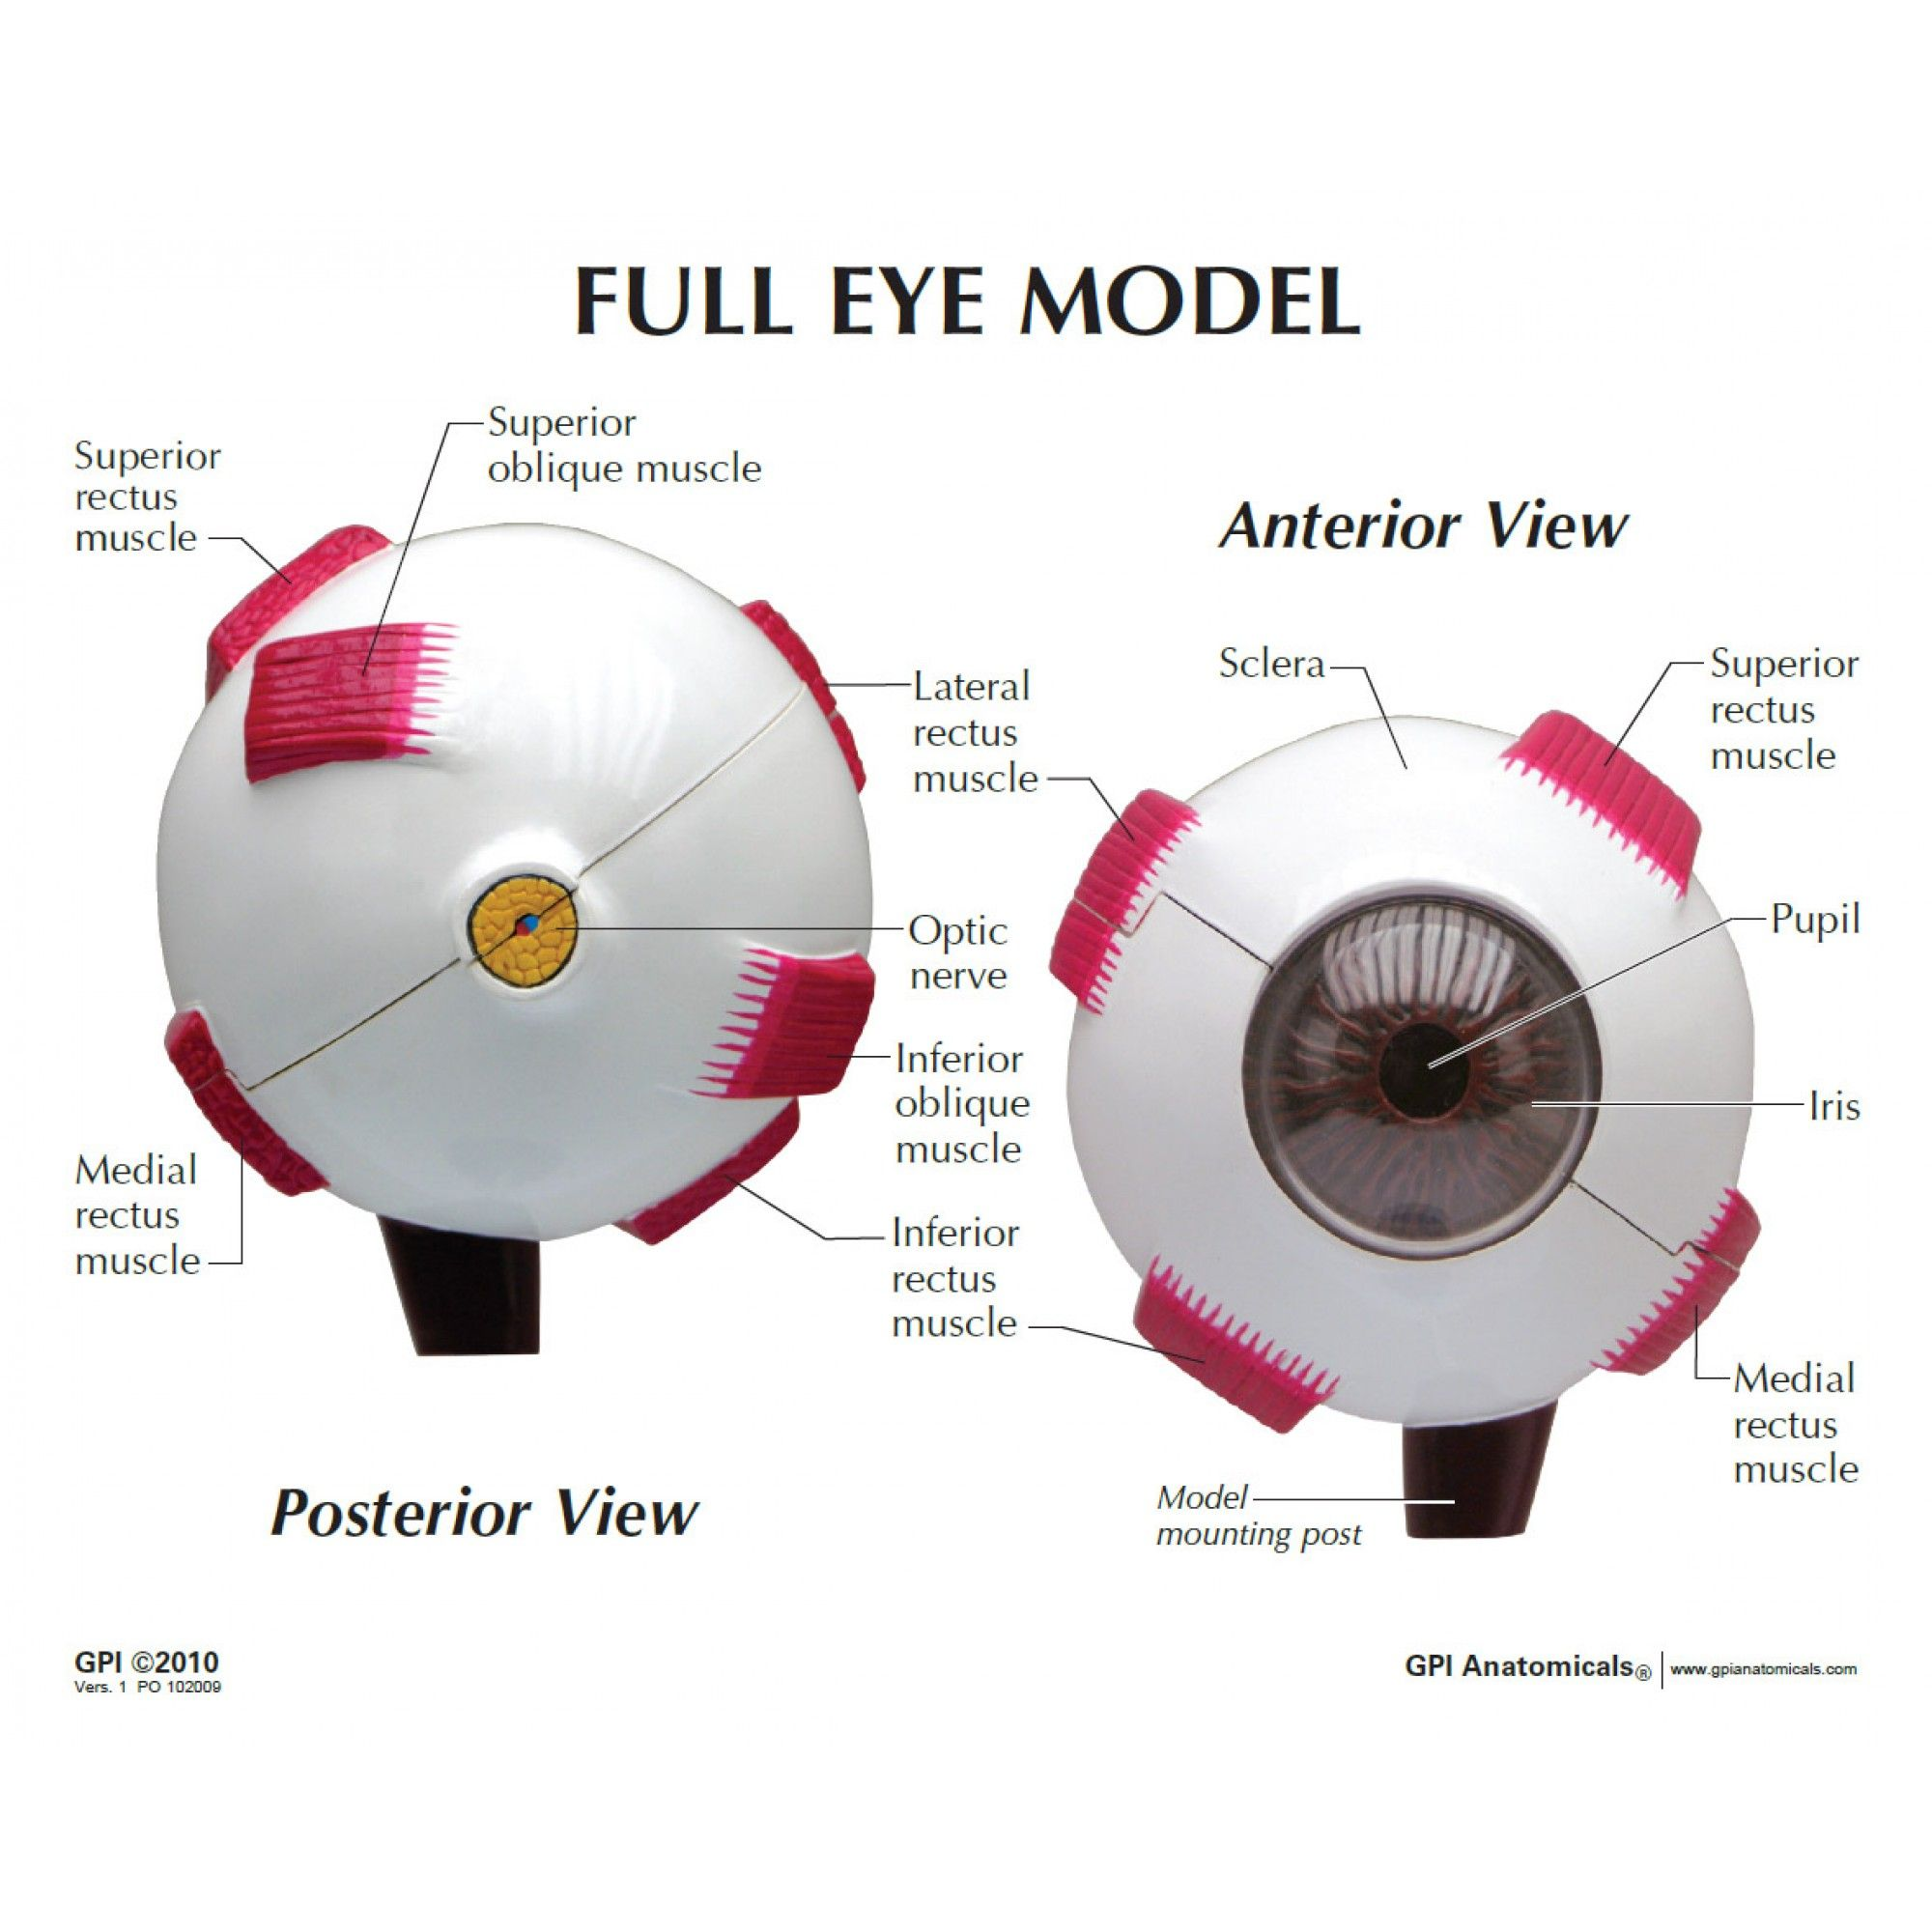 Eye Model - Labeled | Anatomy, physiology, Eye anatomy ...